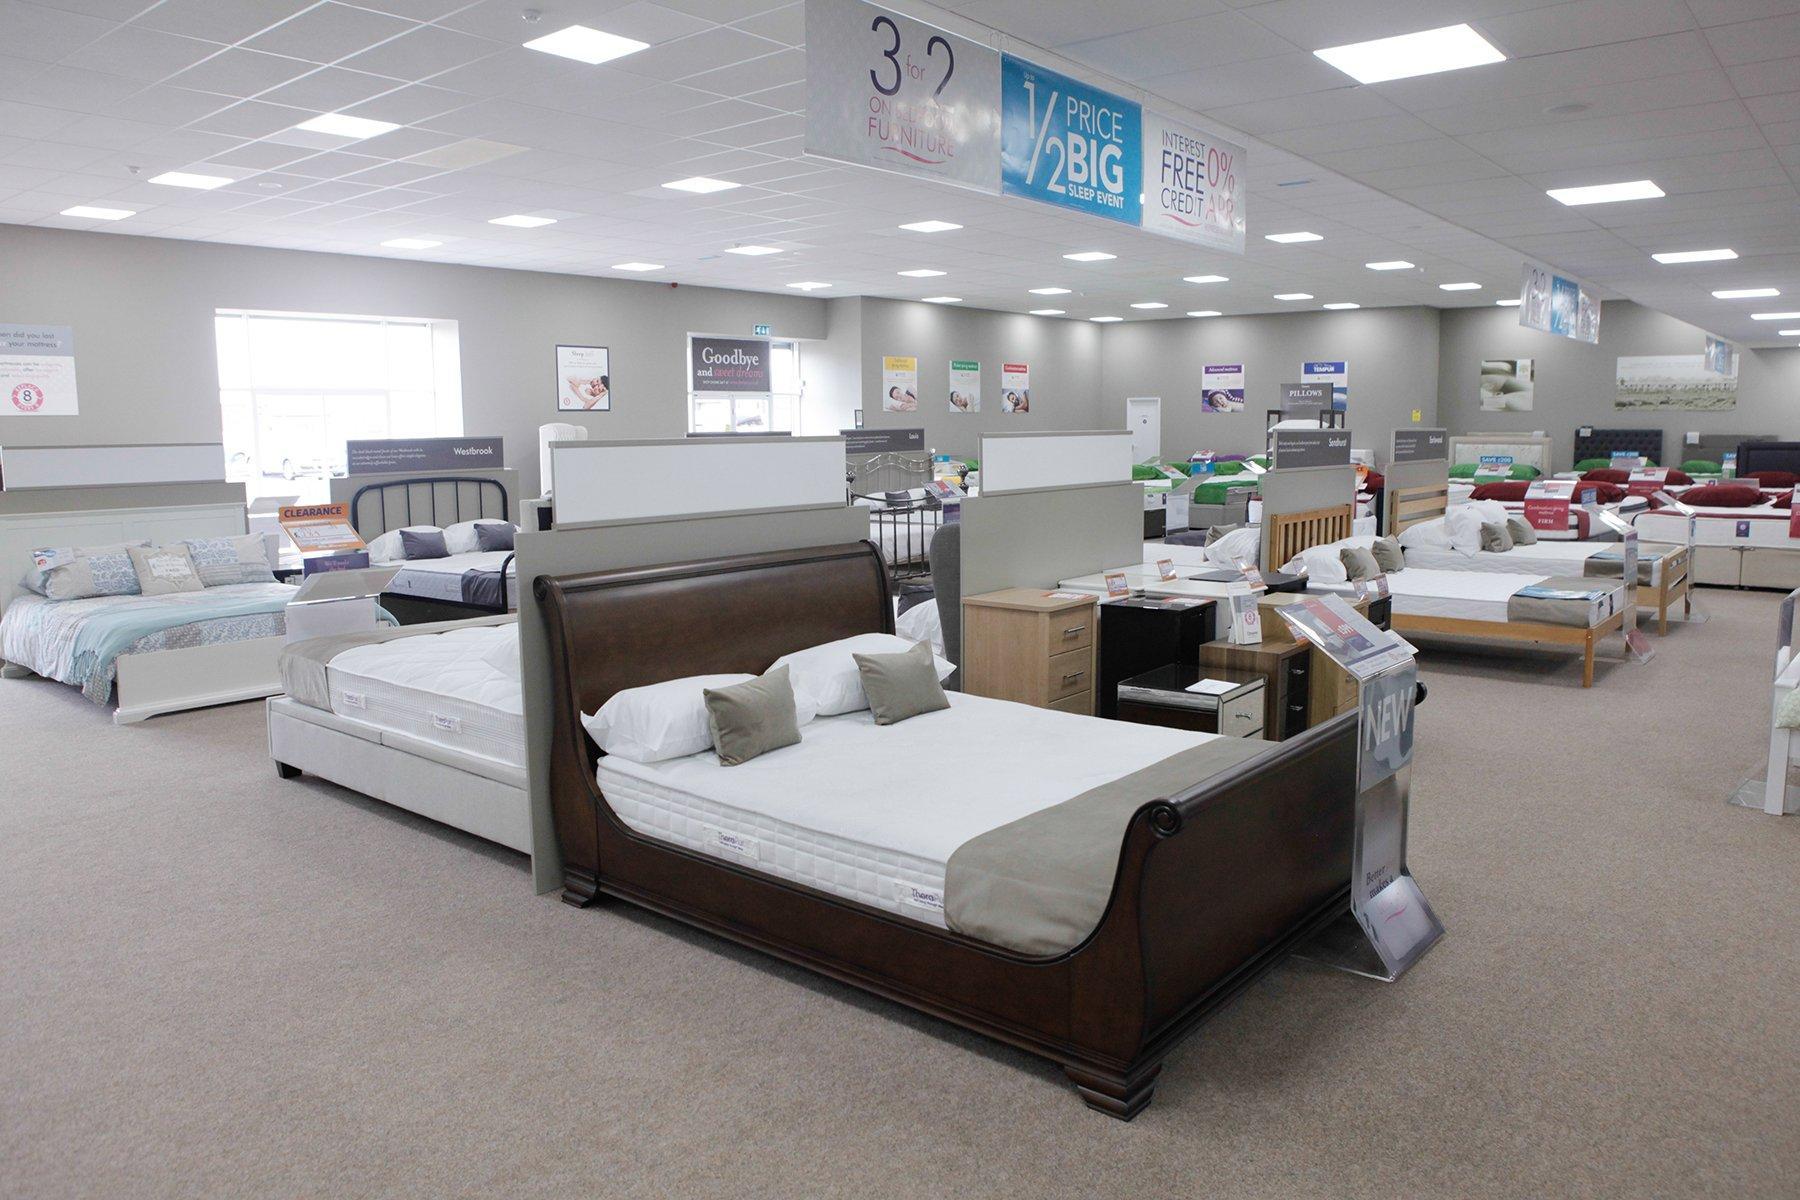 dream sofas wishaw ethan allen dreams store in glasgow uddingston beds mattresses furniture